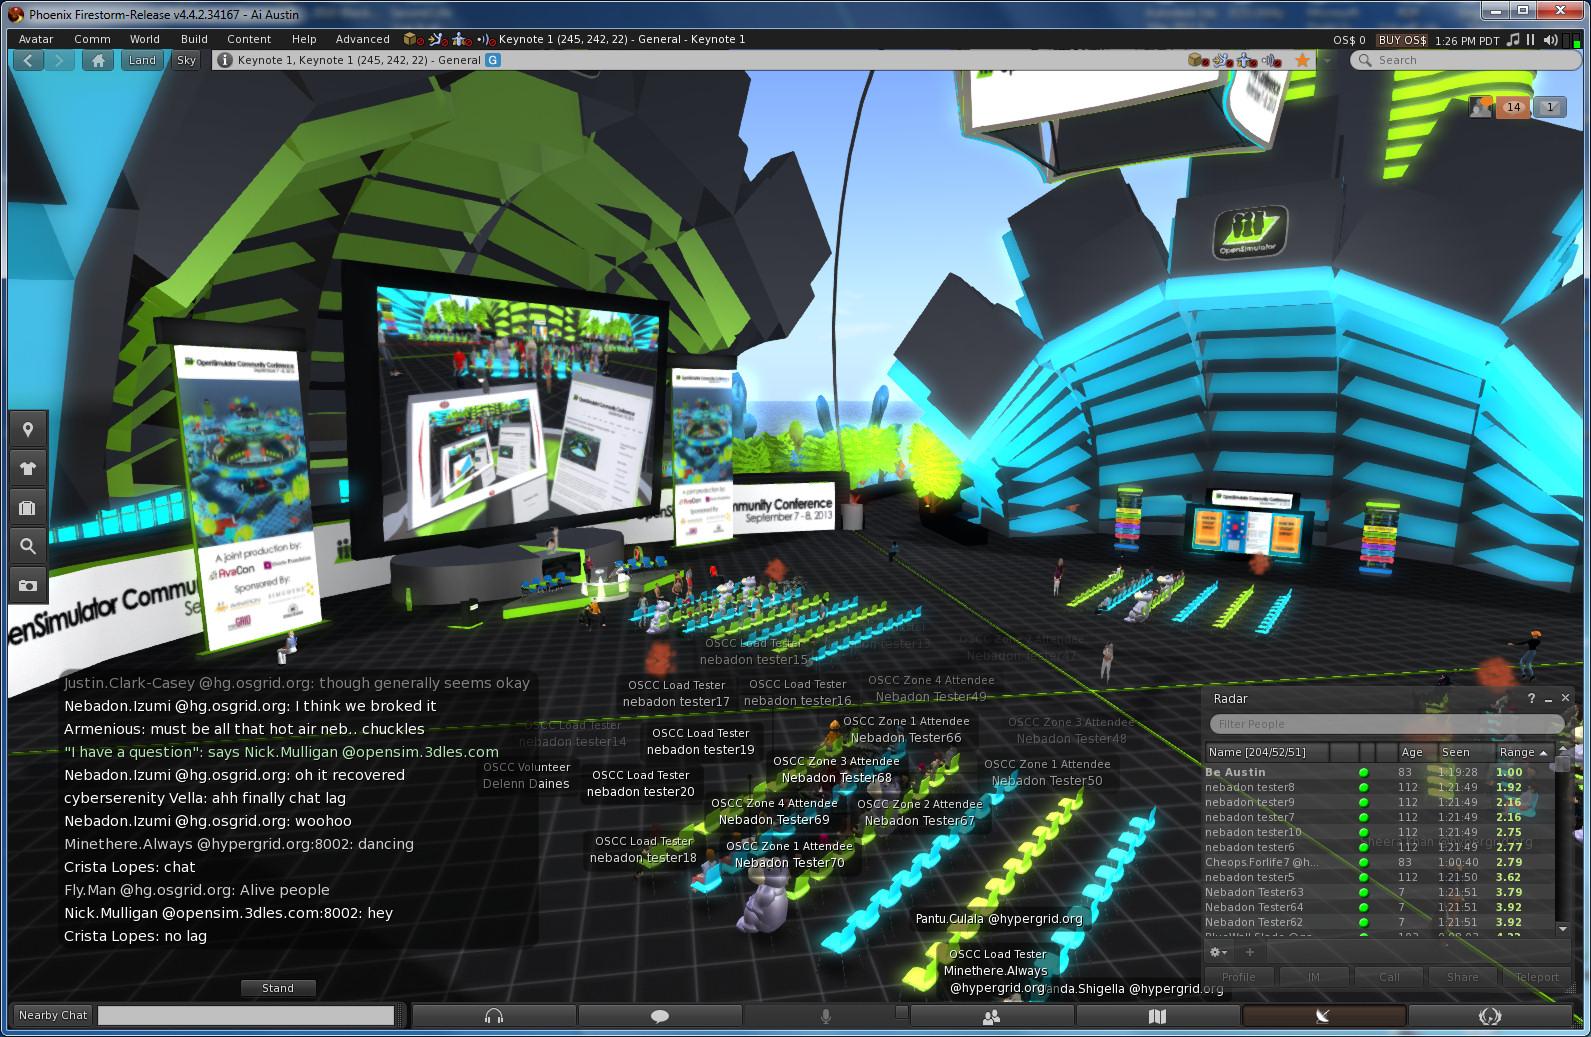 2013-09-02-Load-Test-4-Sim-View-2